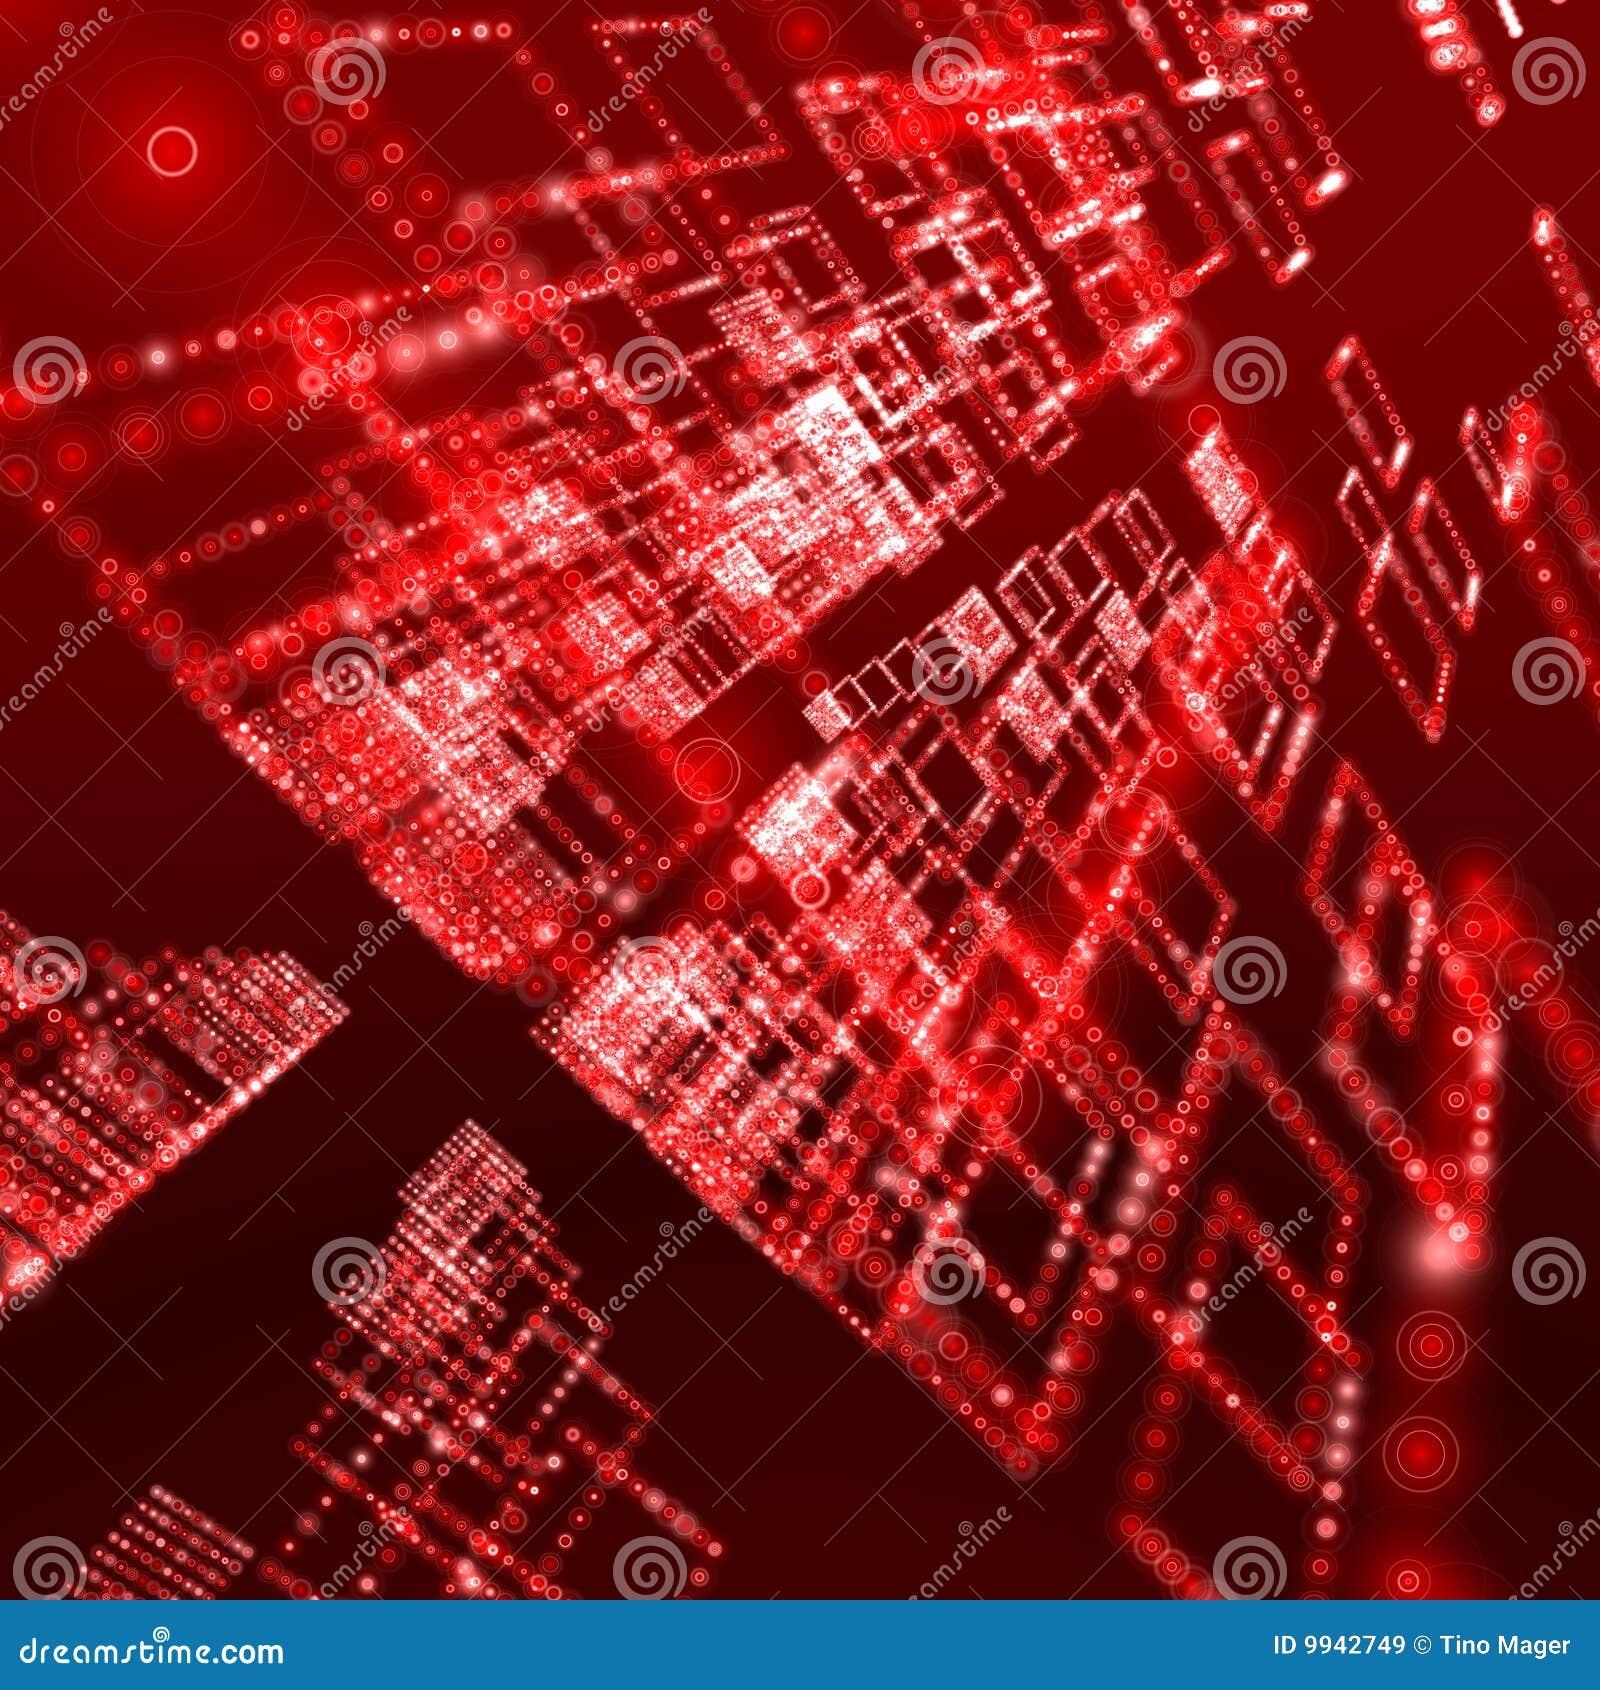 Red Digital Background Designs